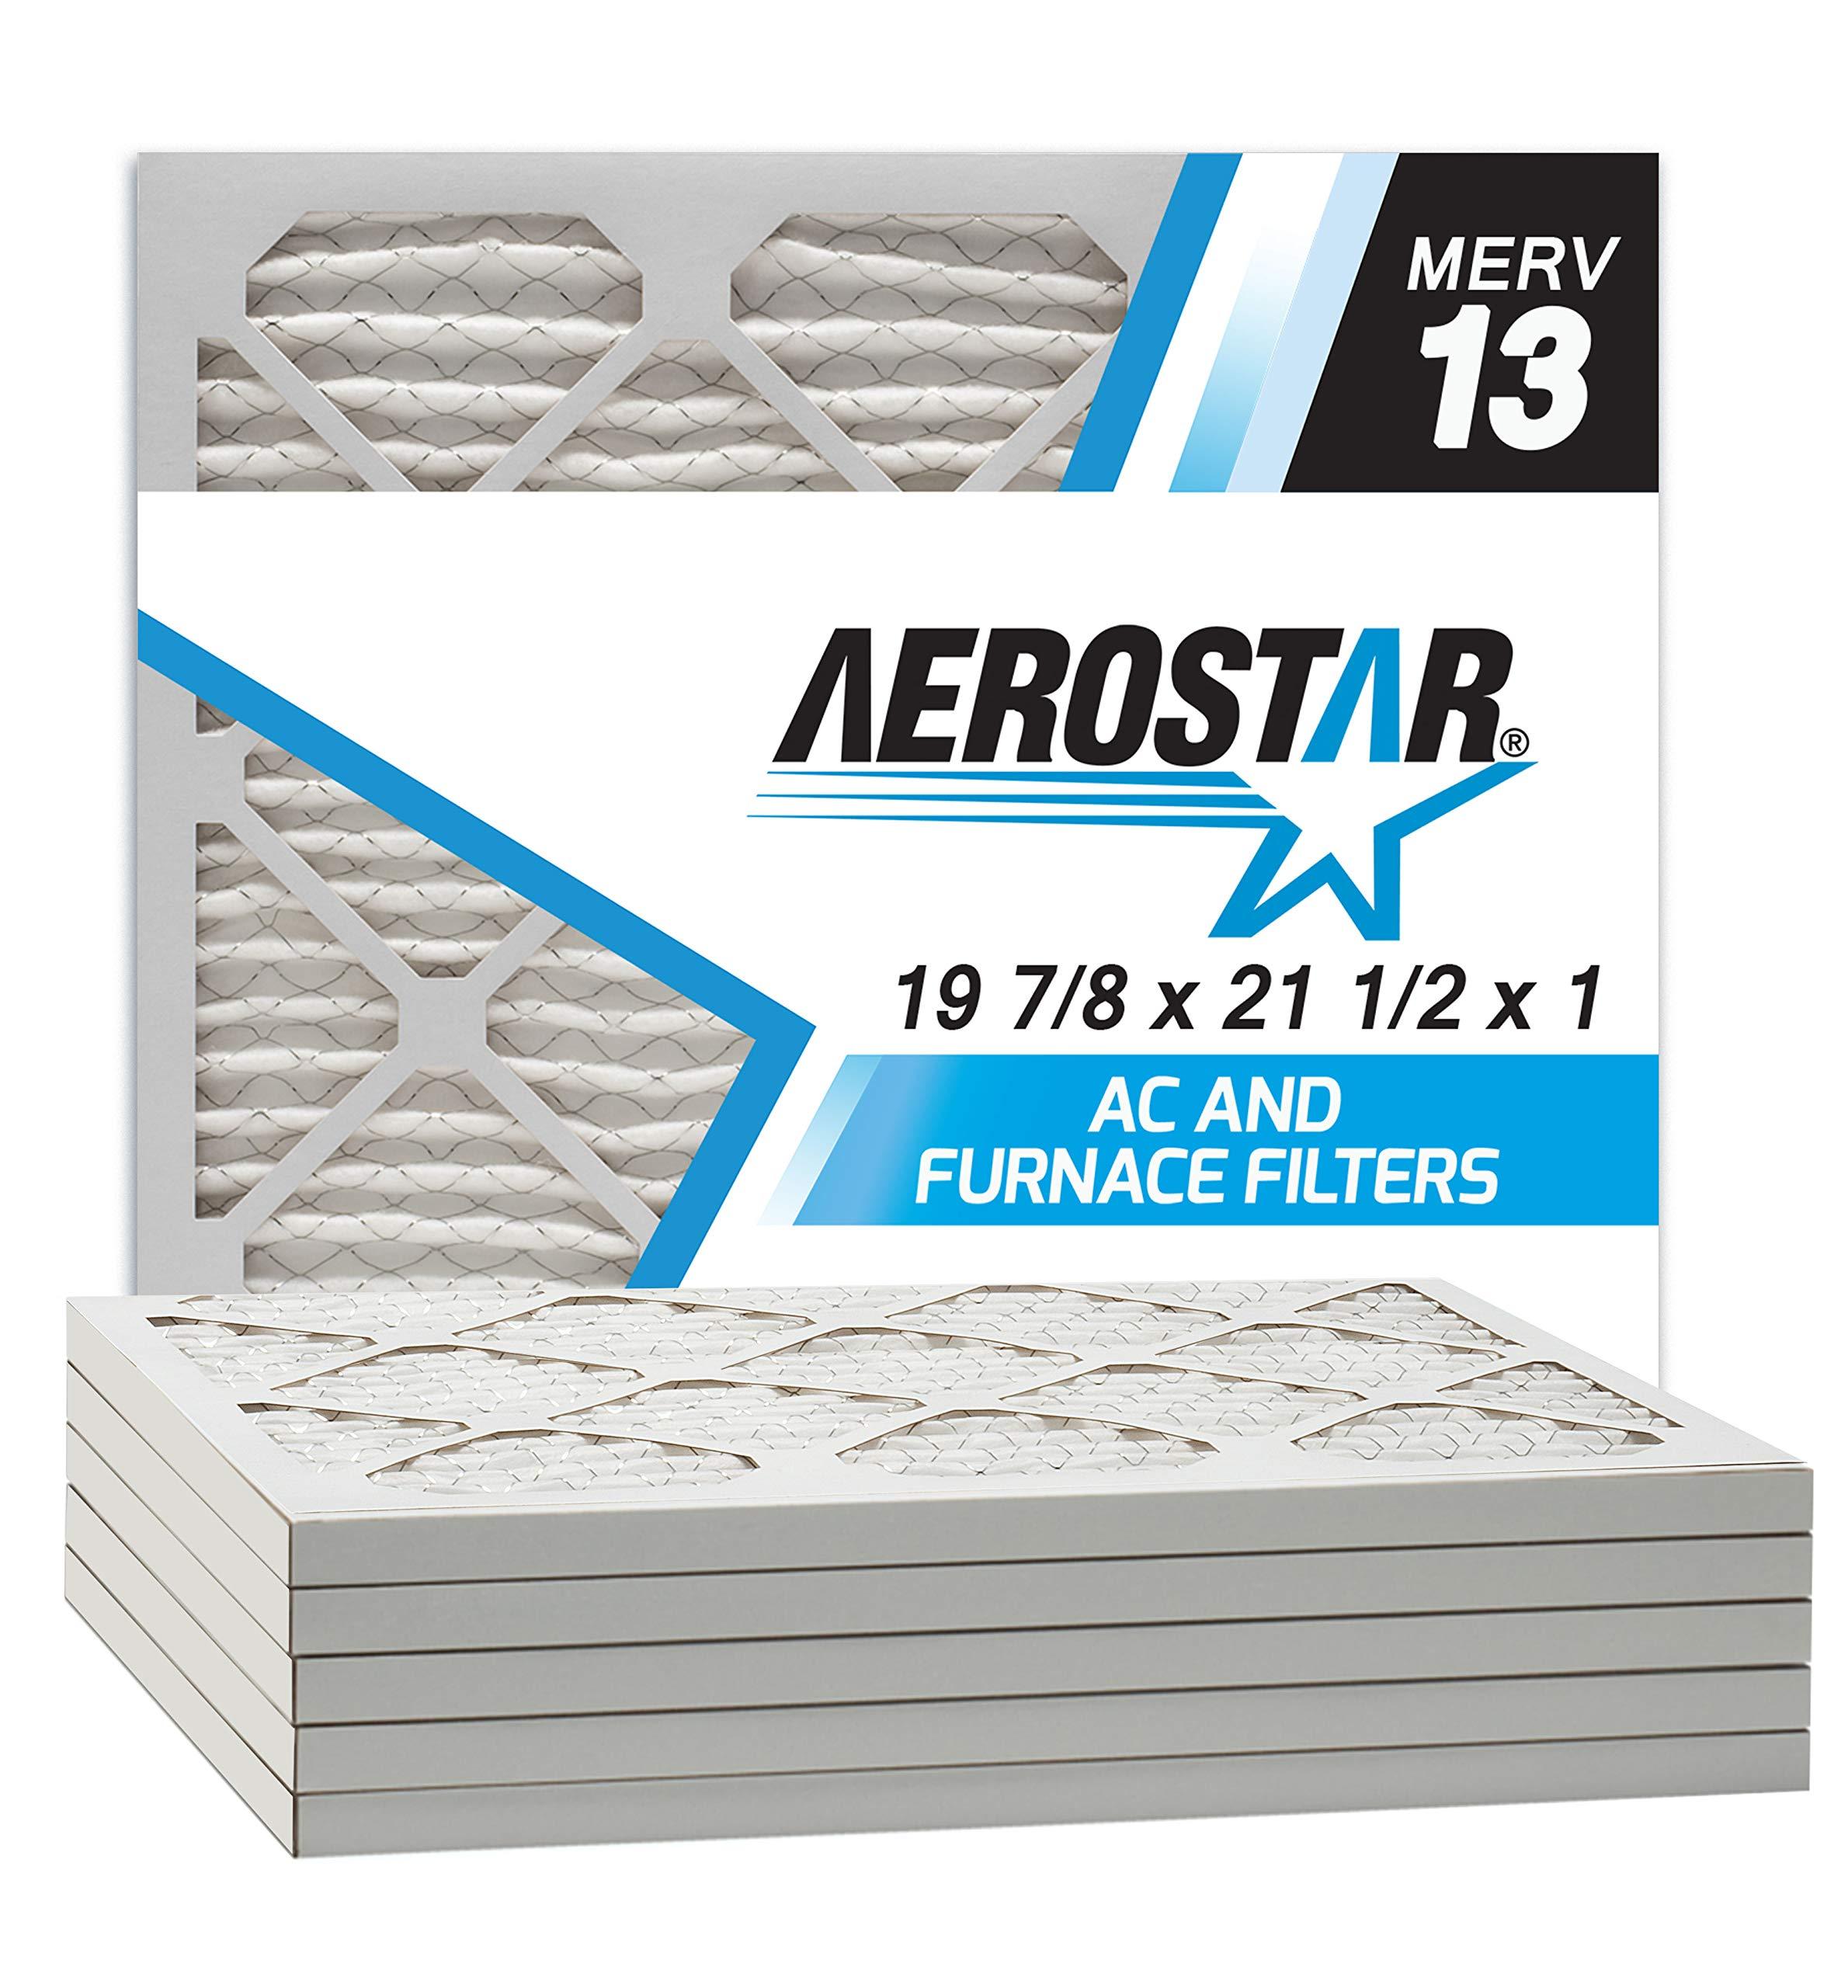 Aerostar 19 7/8 x 21 1/2x1 MERV 13 Pleated Air Filter, Made in the USA, 6-Pack by Aerostar